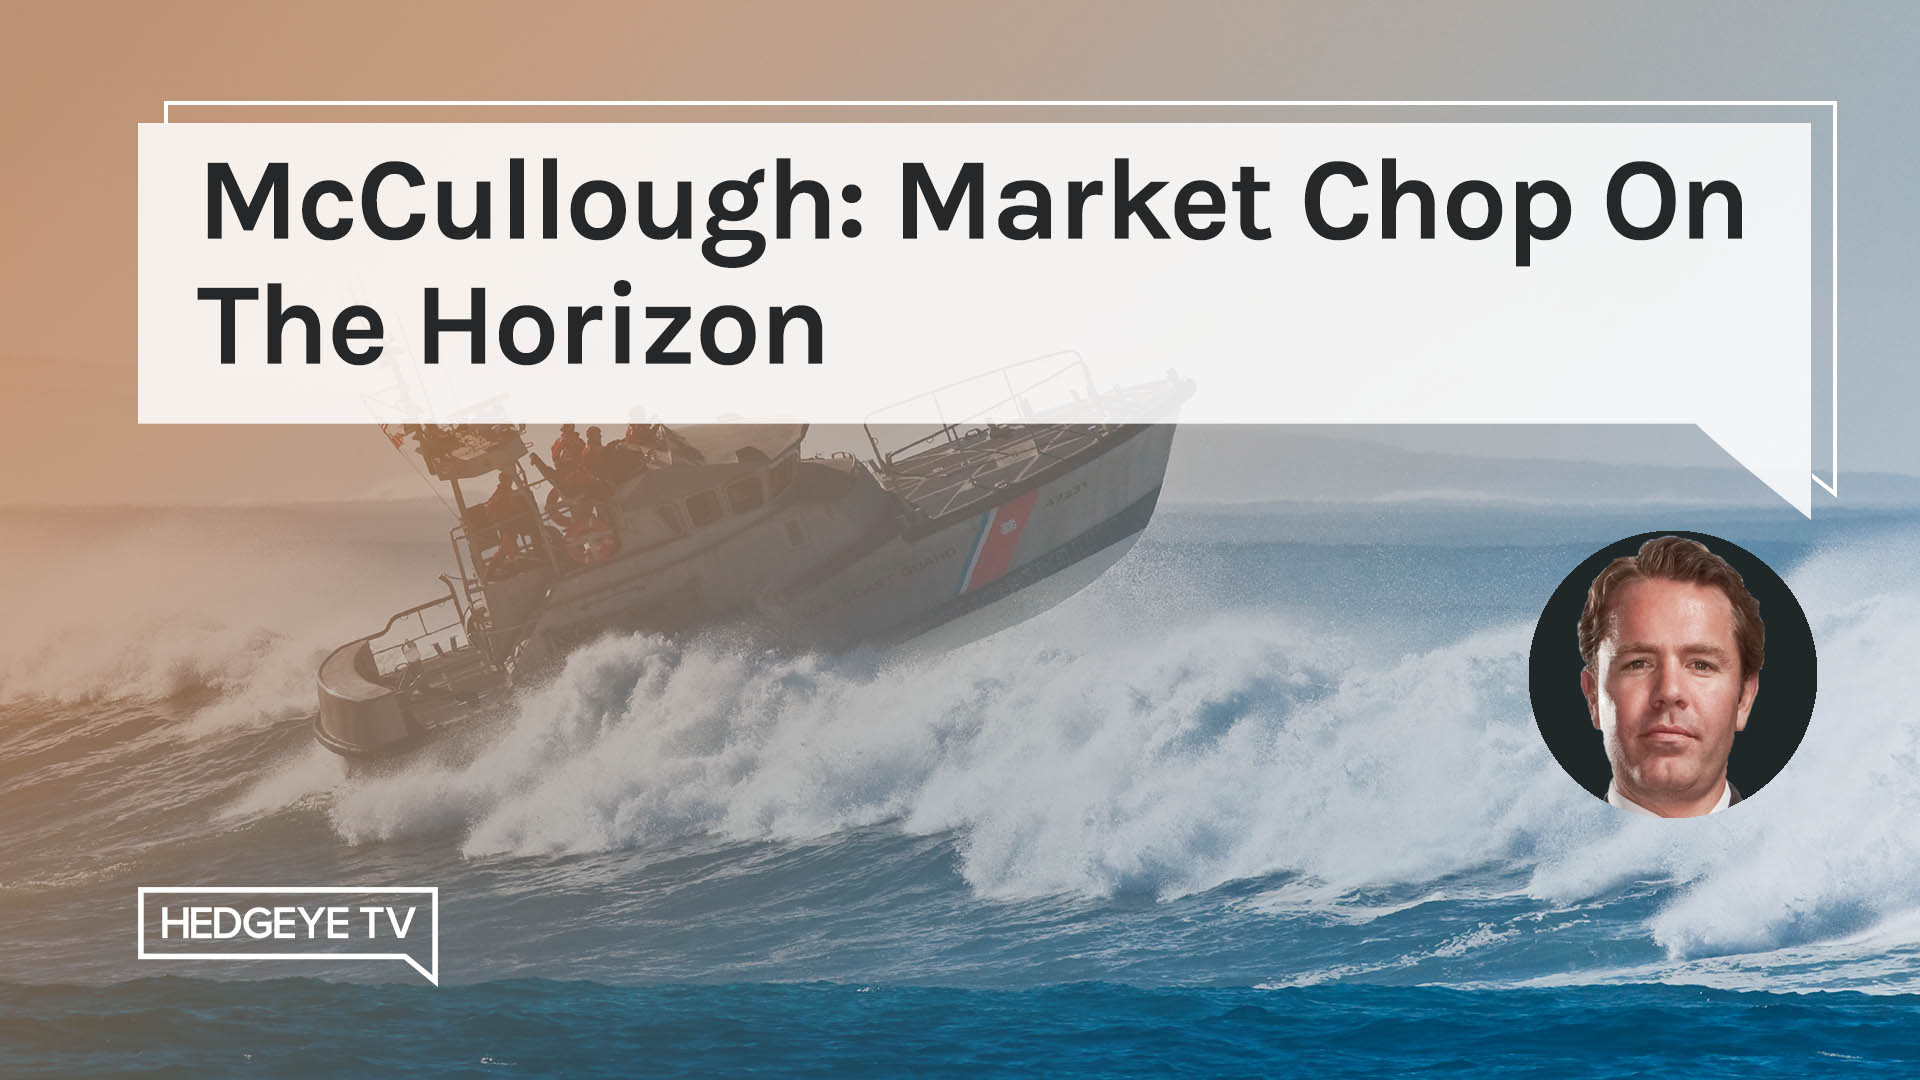 McCullough: Market Chop On The Horizon